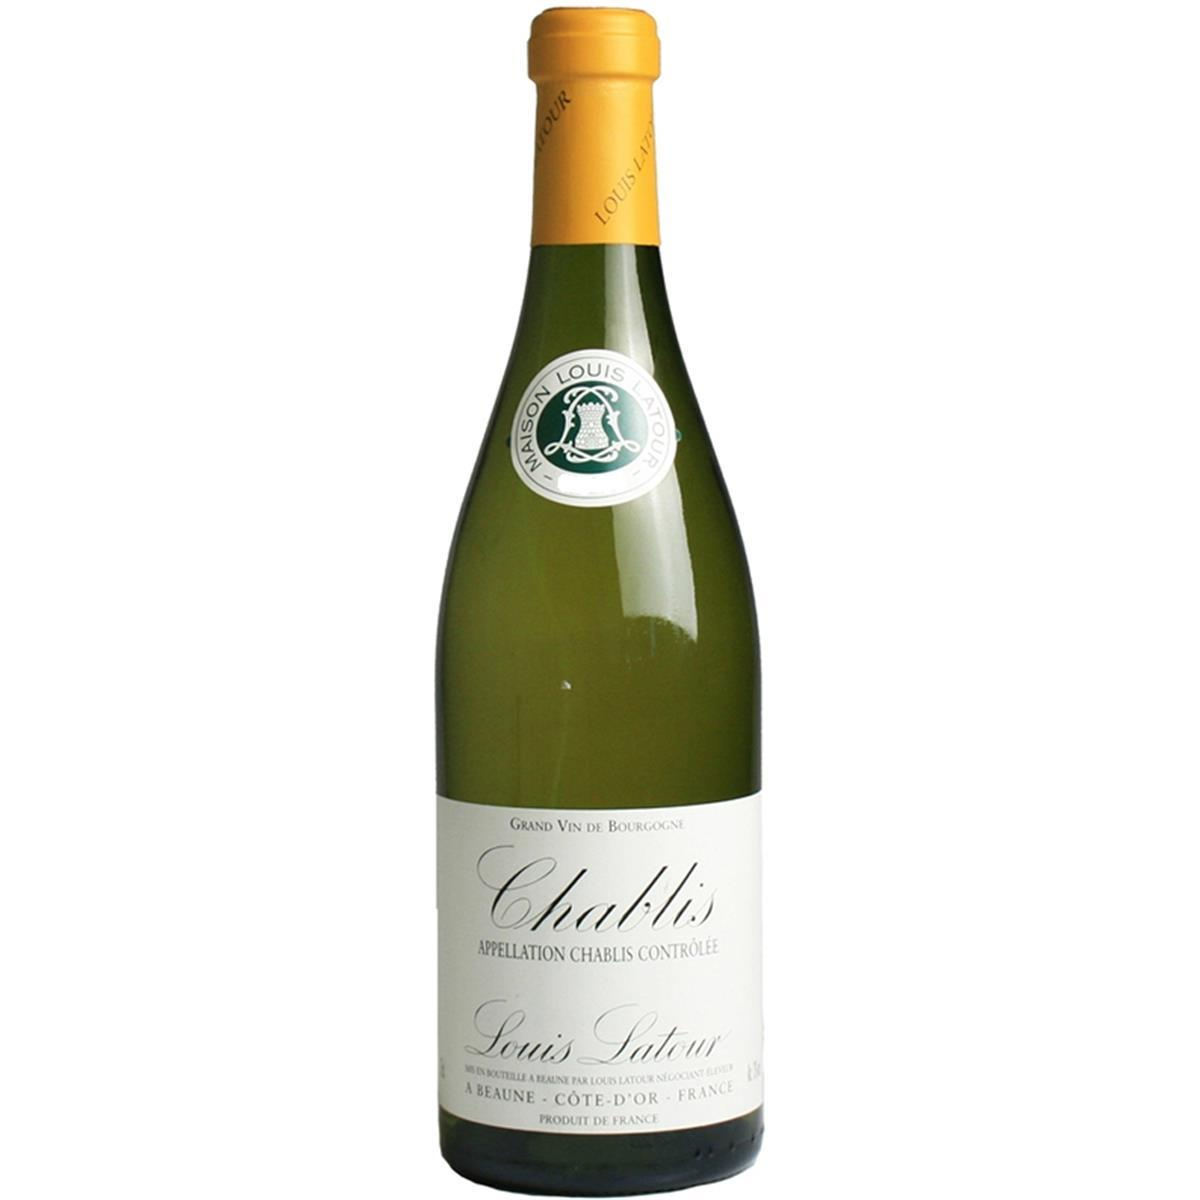 Vinho Branco Louis Latour Chablis 750ml